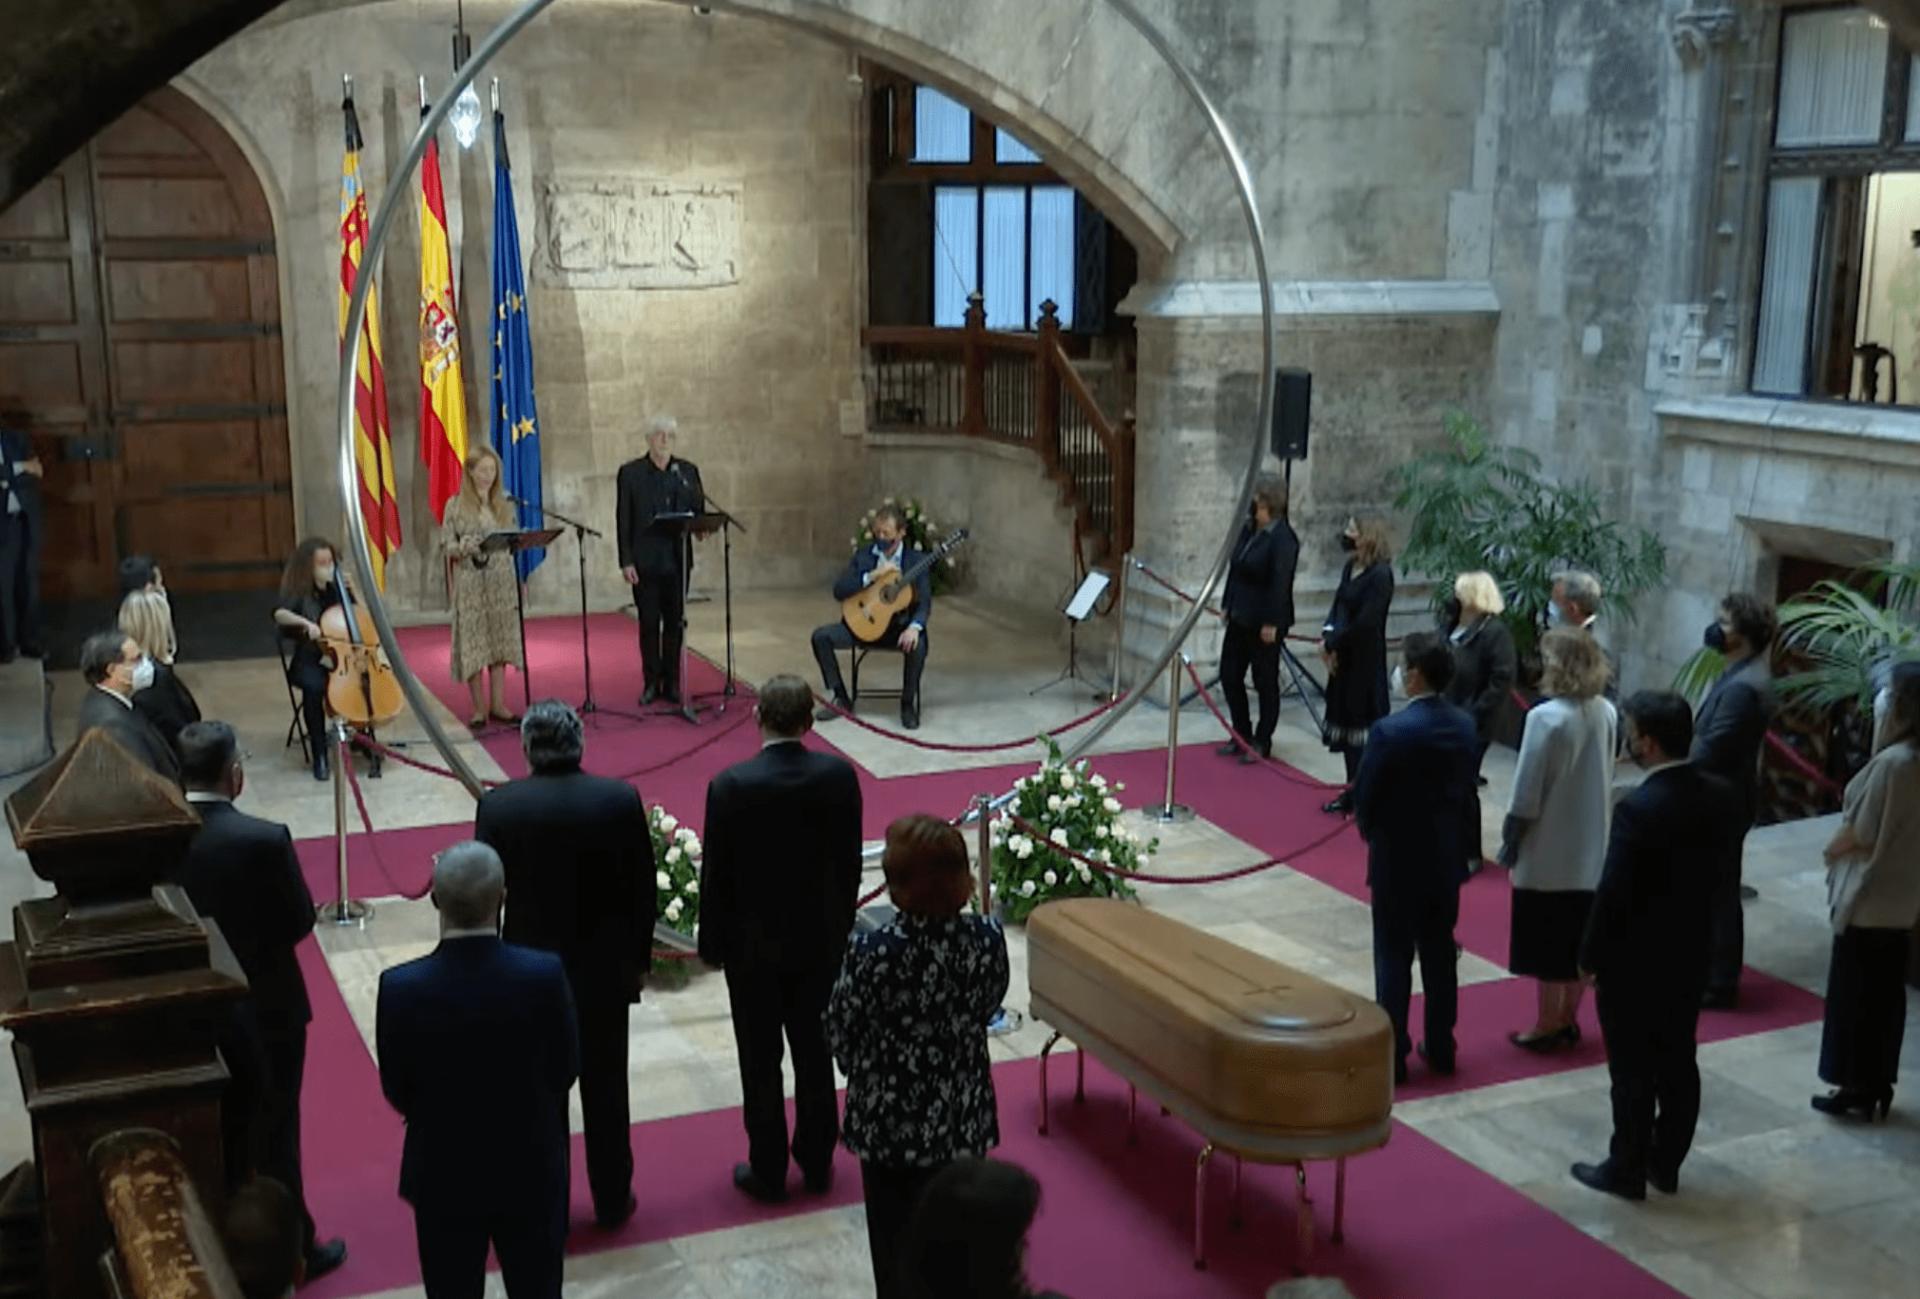 Homenaje al poeta Brines en el Palau de la Generalitat